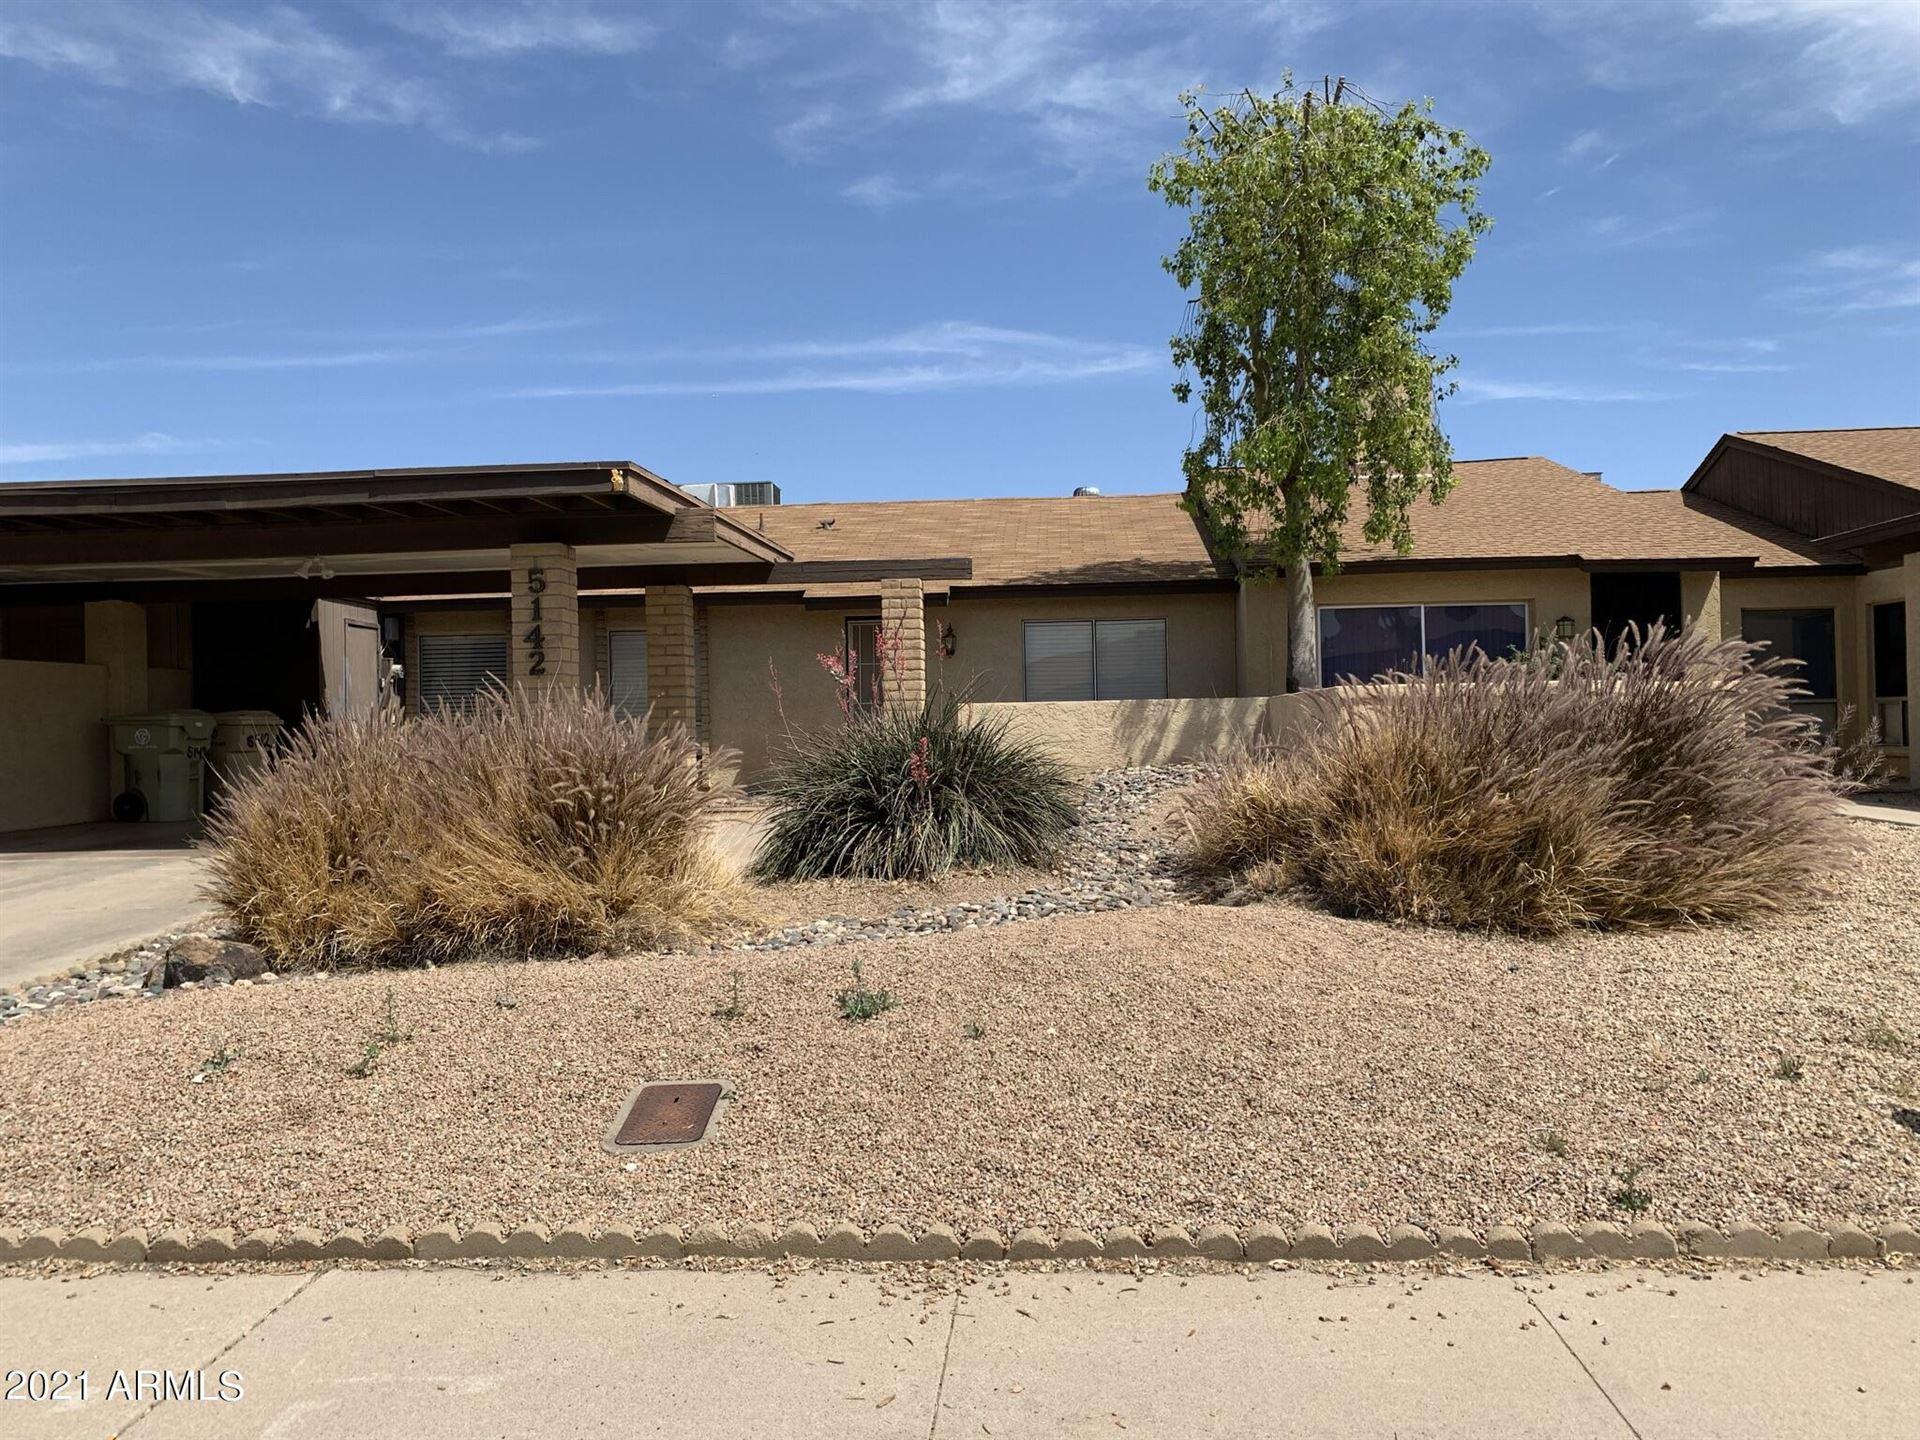 5142 W VOGEL Avenue, Glendale, AZ 85302 - #: 6231685